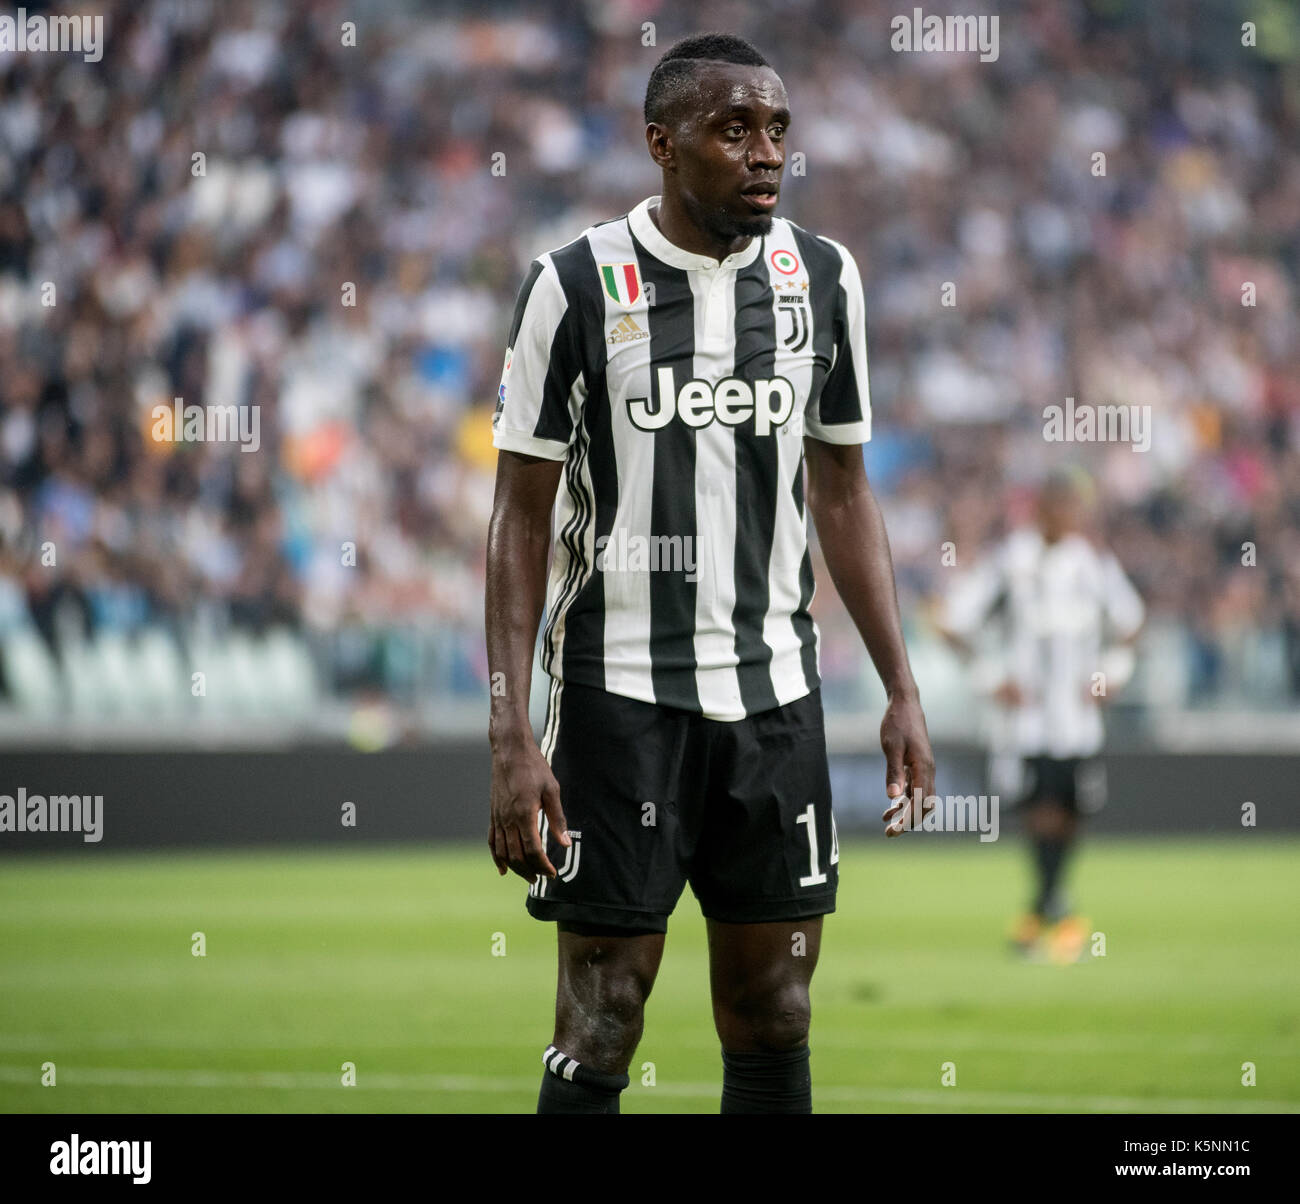 Turin, Italy 9th september, an football match. Juventus vs Chievo Verona, serie A tim at allianz Stadium - Stock Image